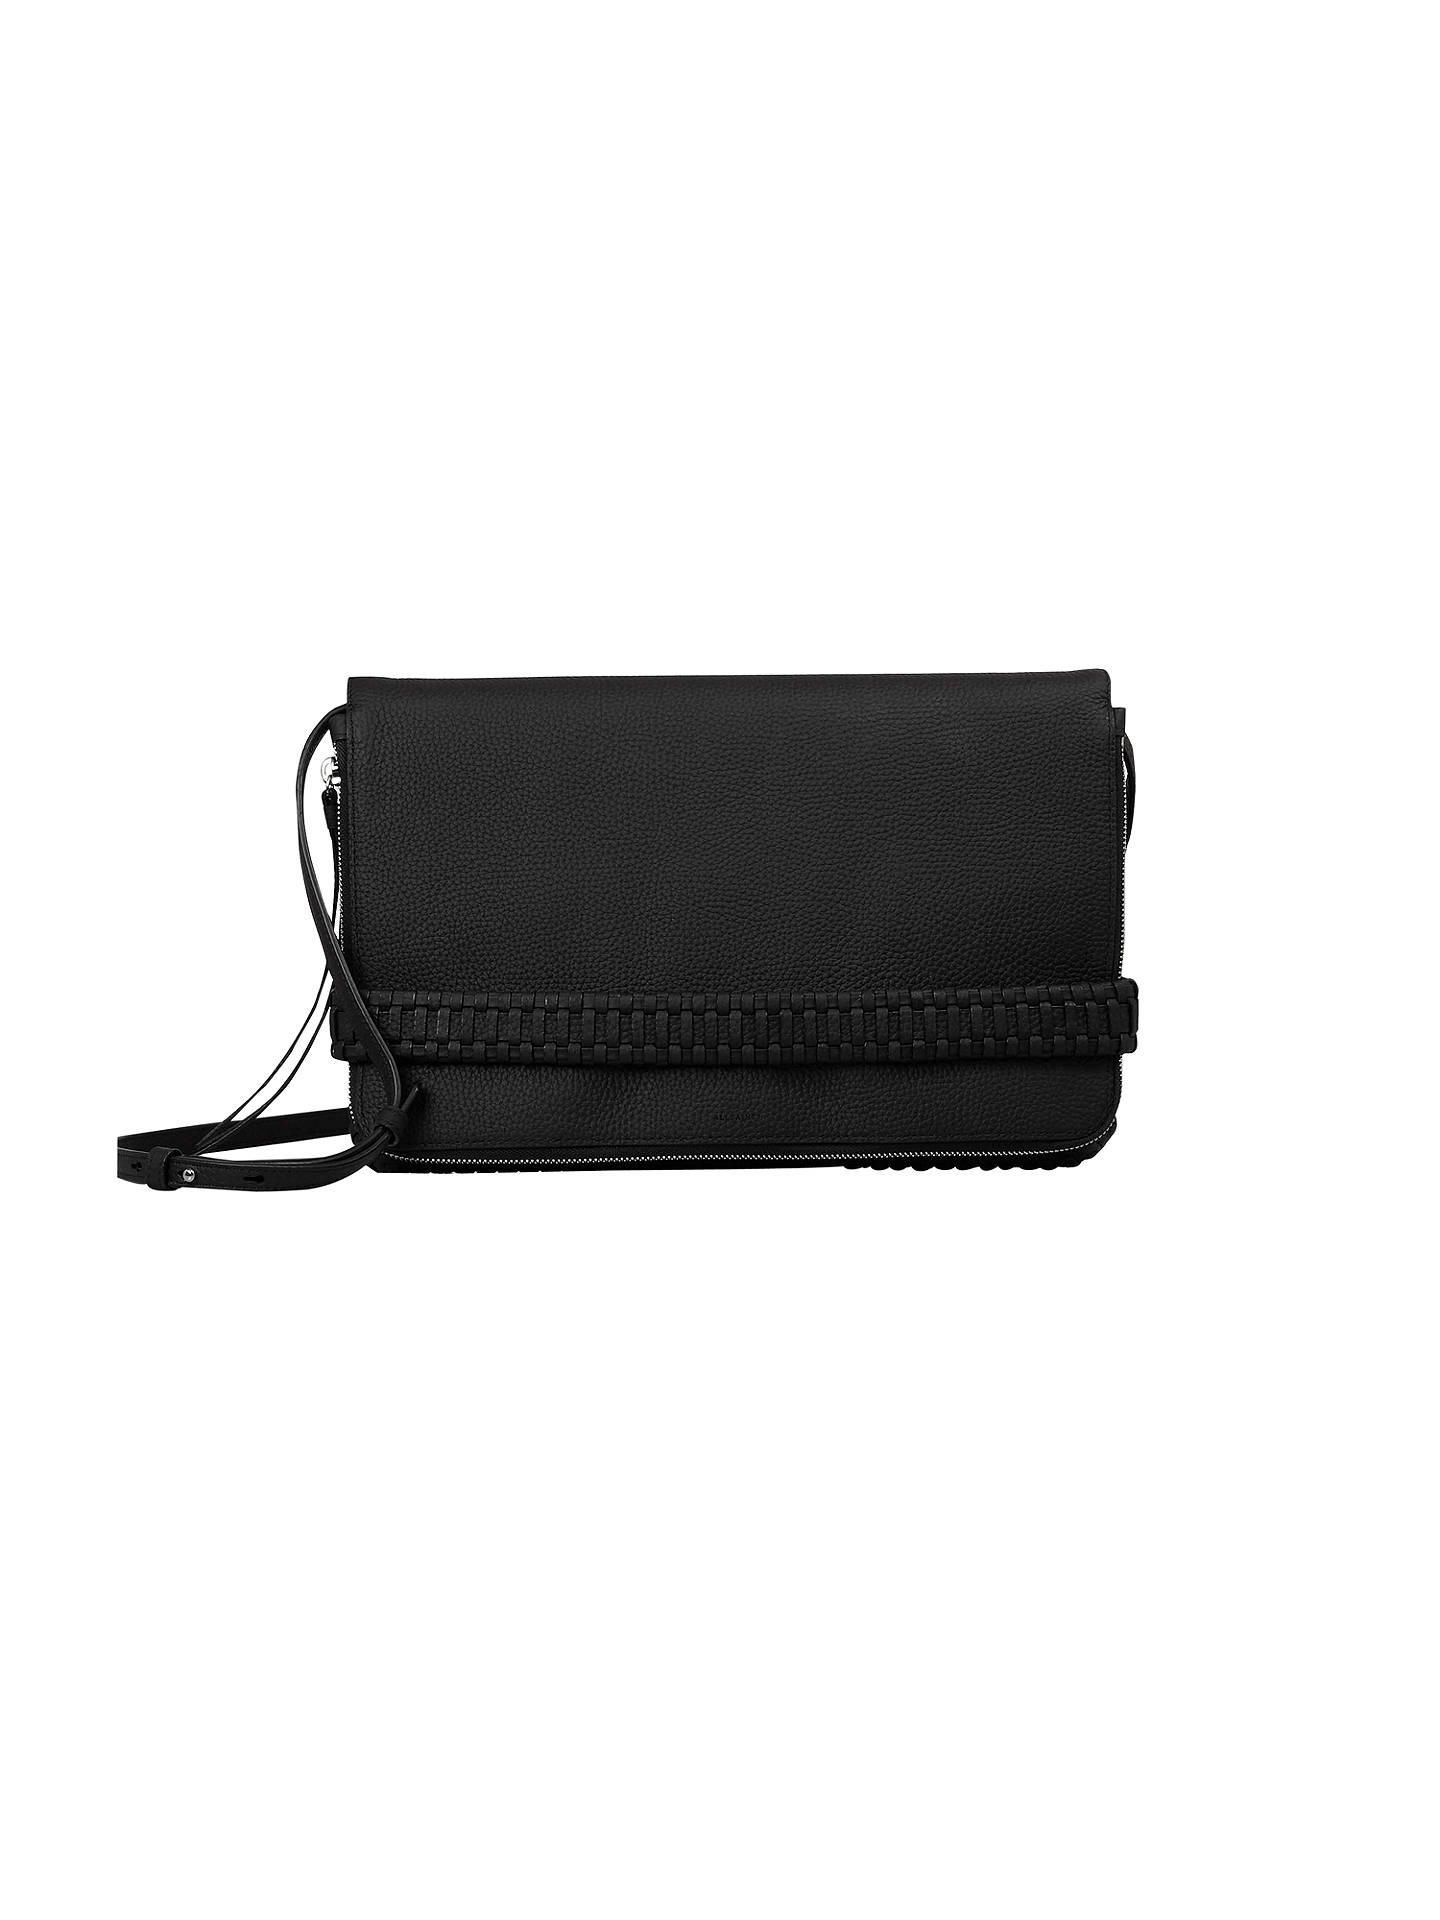 71ae782fd2 Buy AllSaints Club Large Clutch Bag, Black Online at johnlewis.com ...